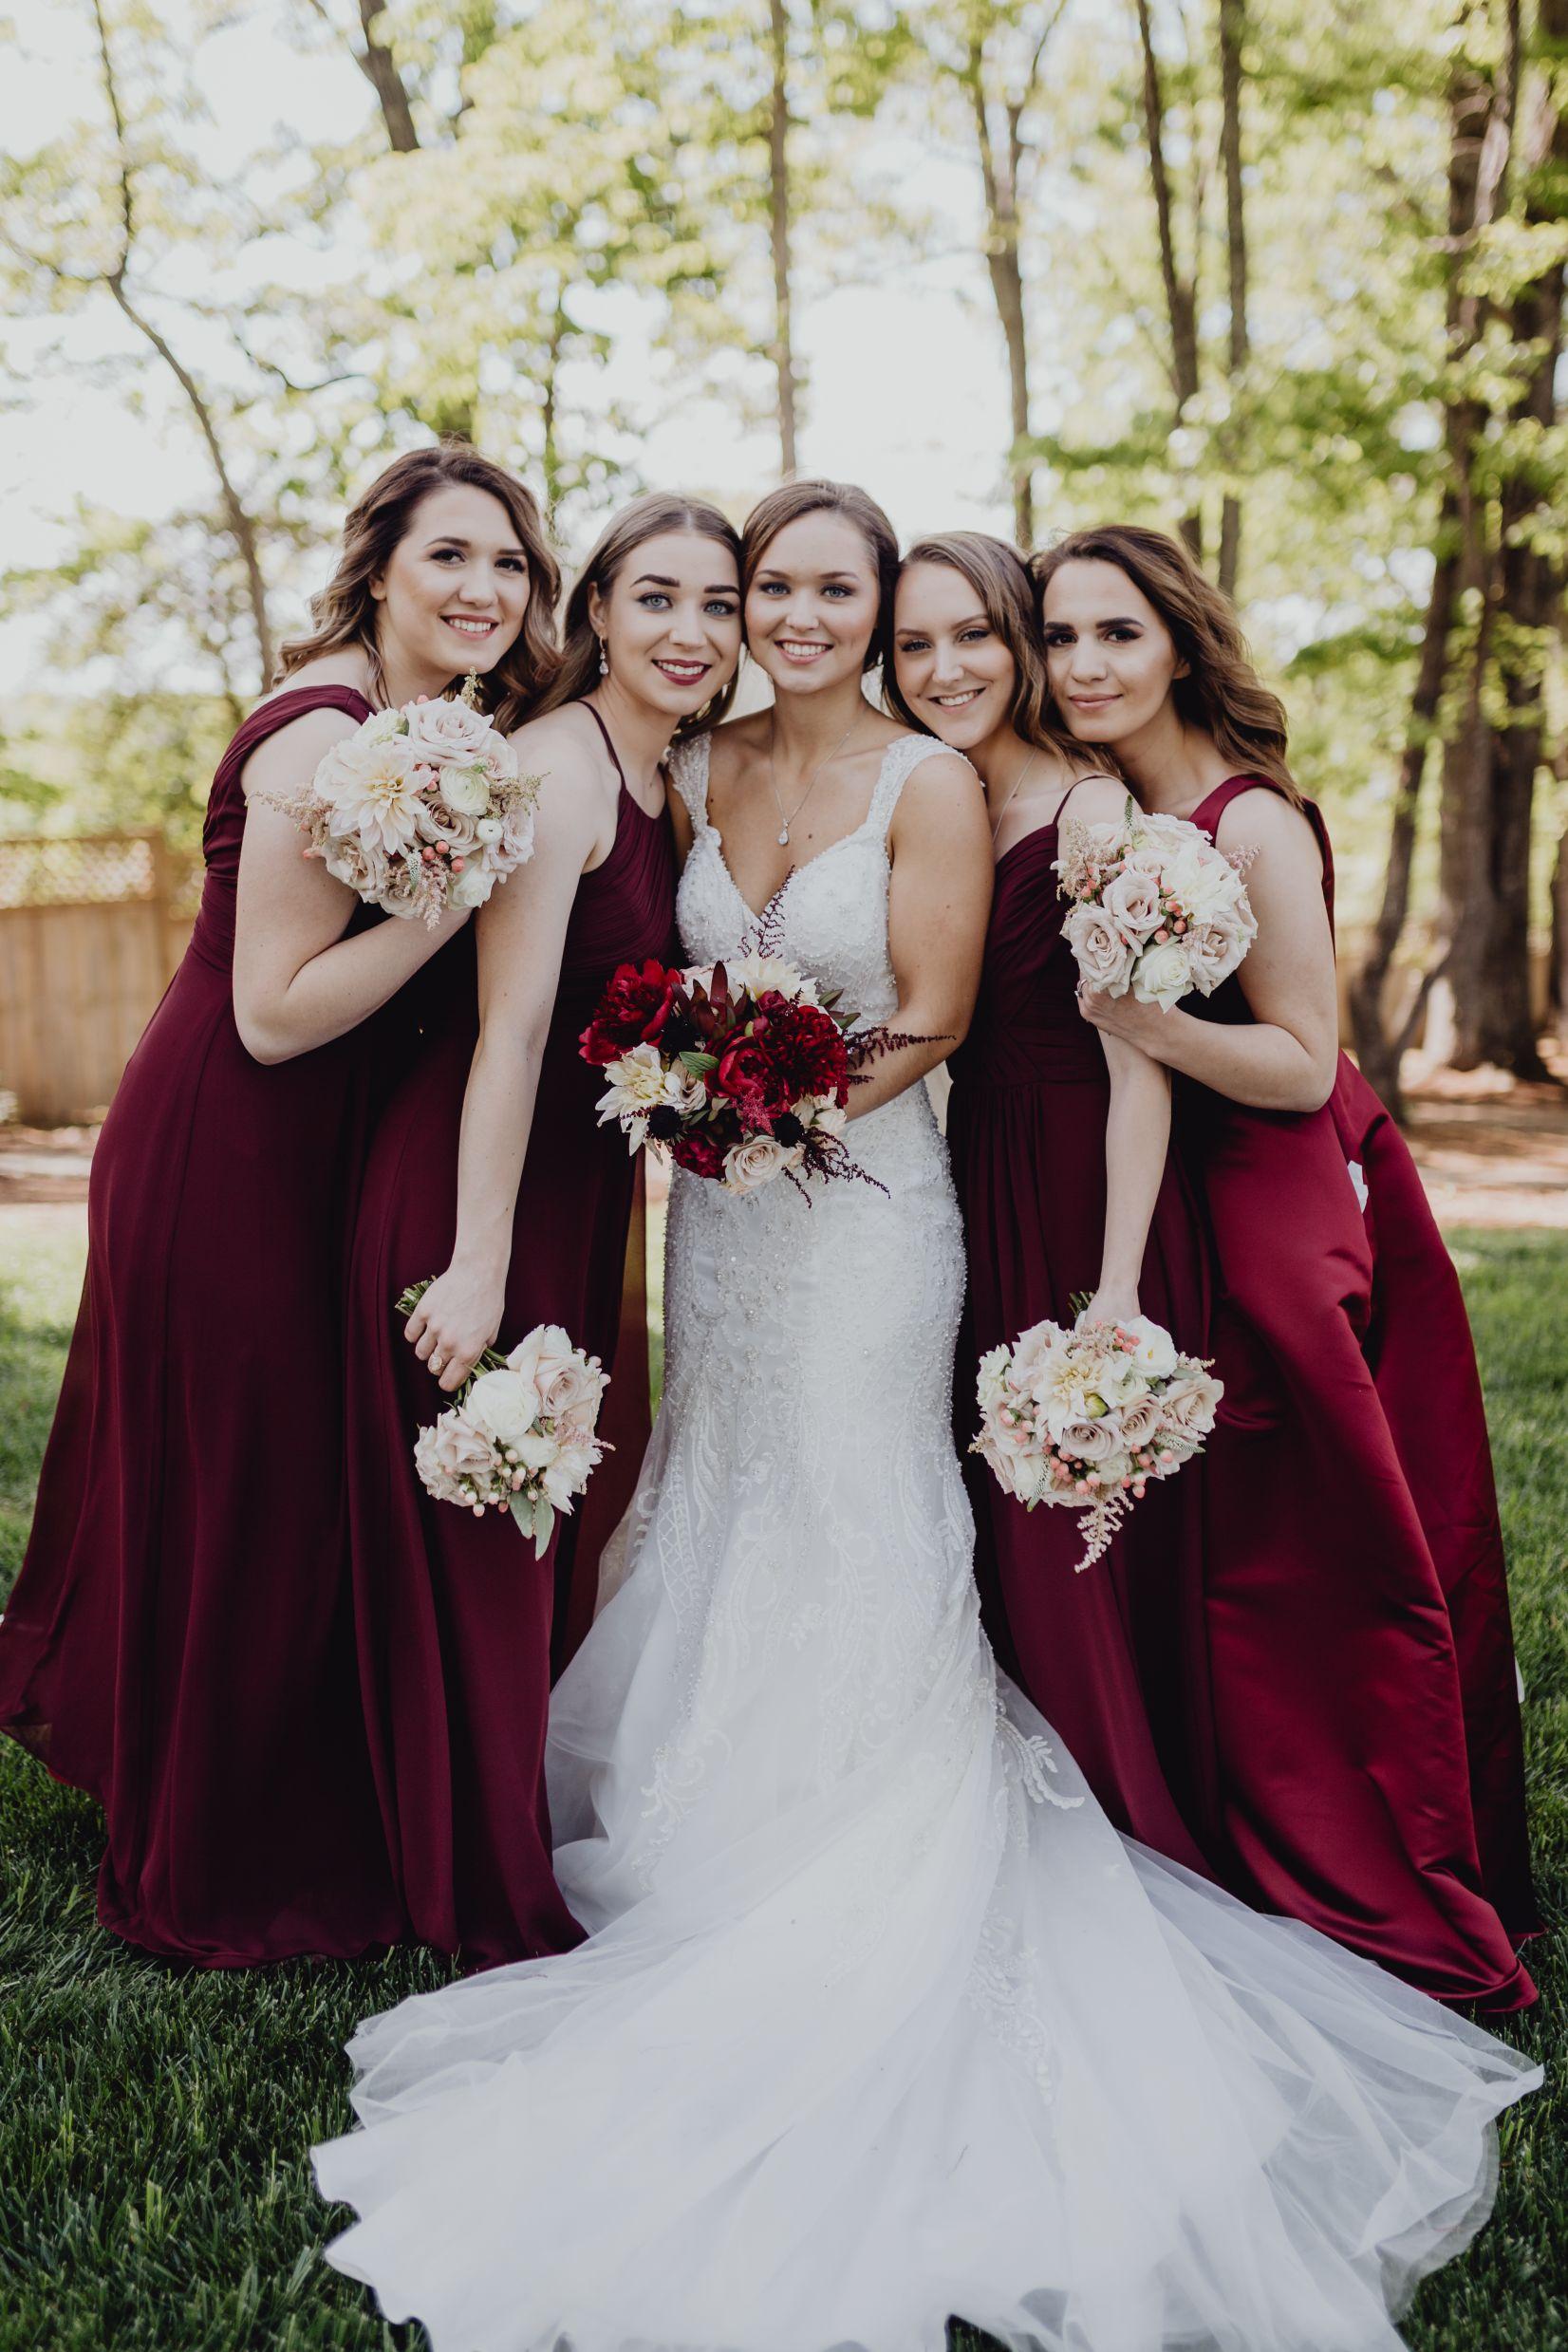 North-Dallas-Wedding-Florist-David-Co.-8.jpg